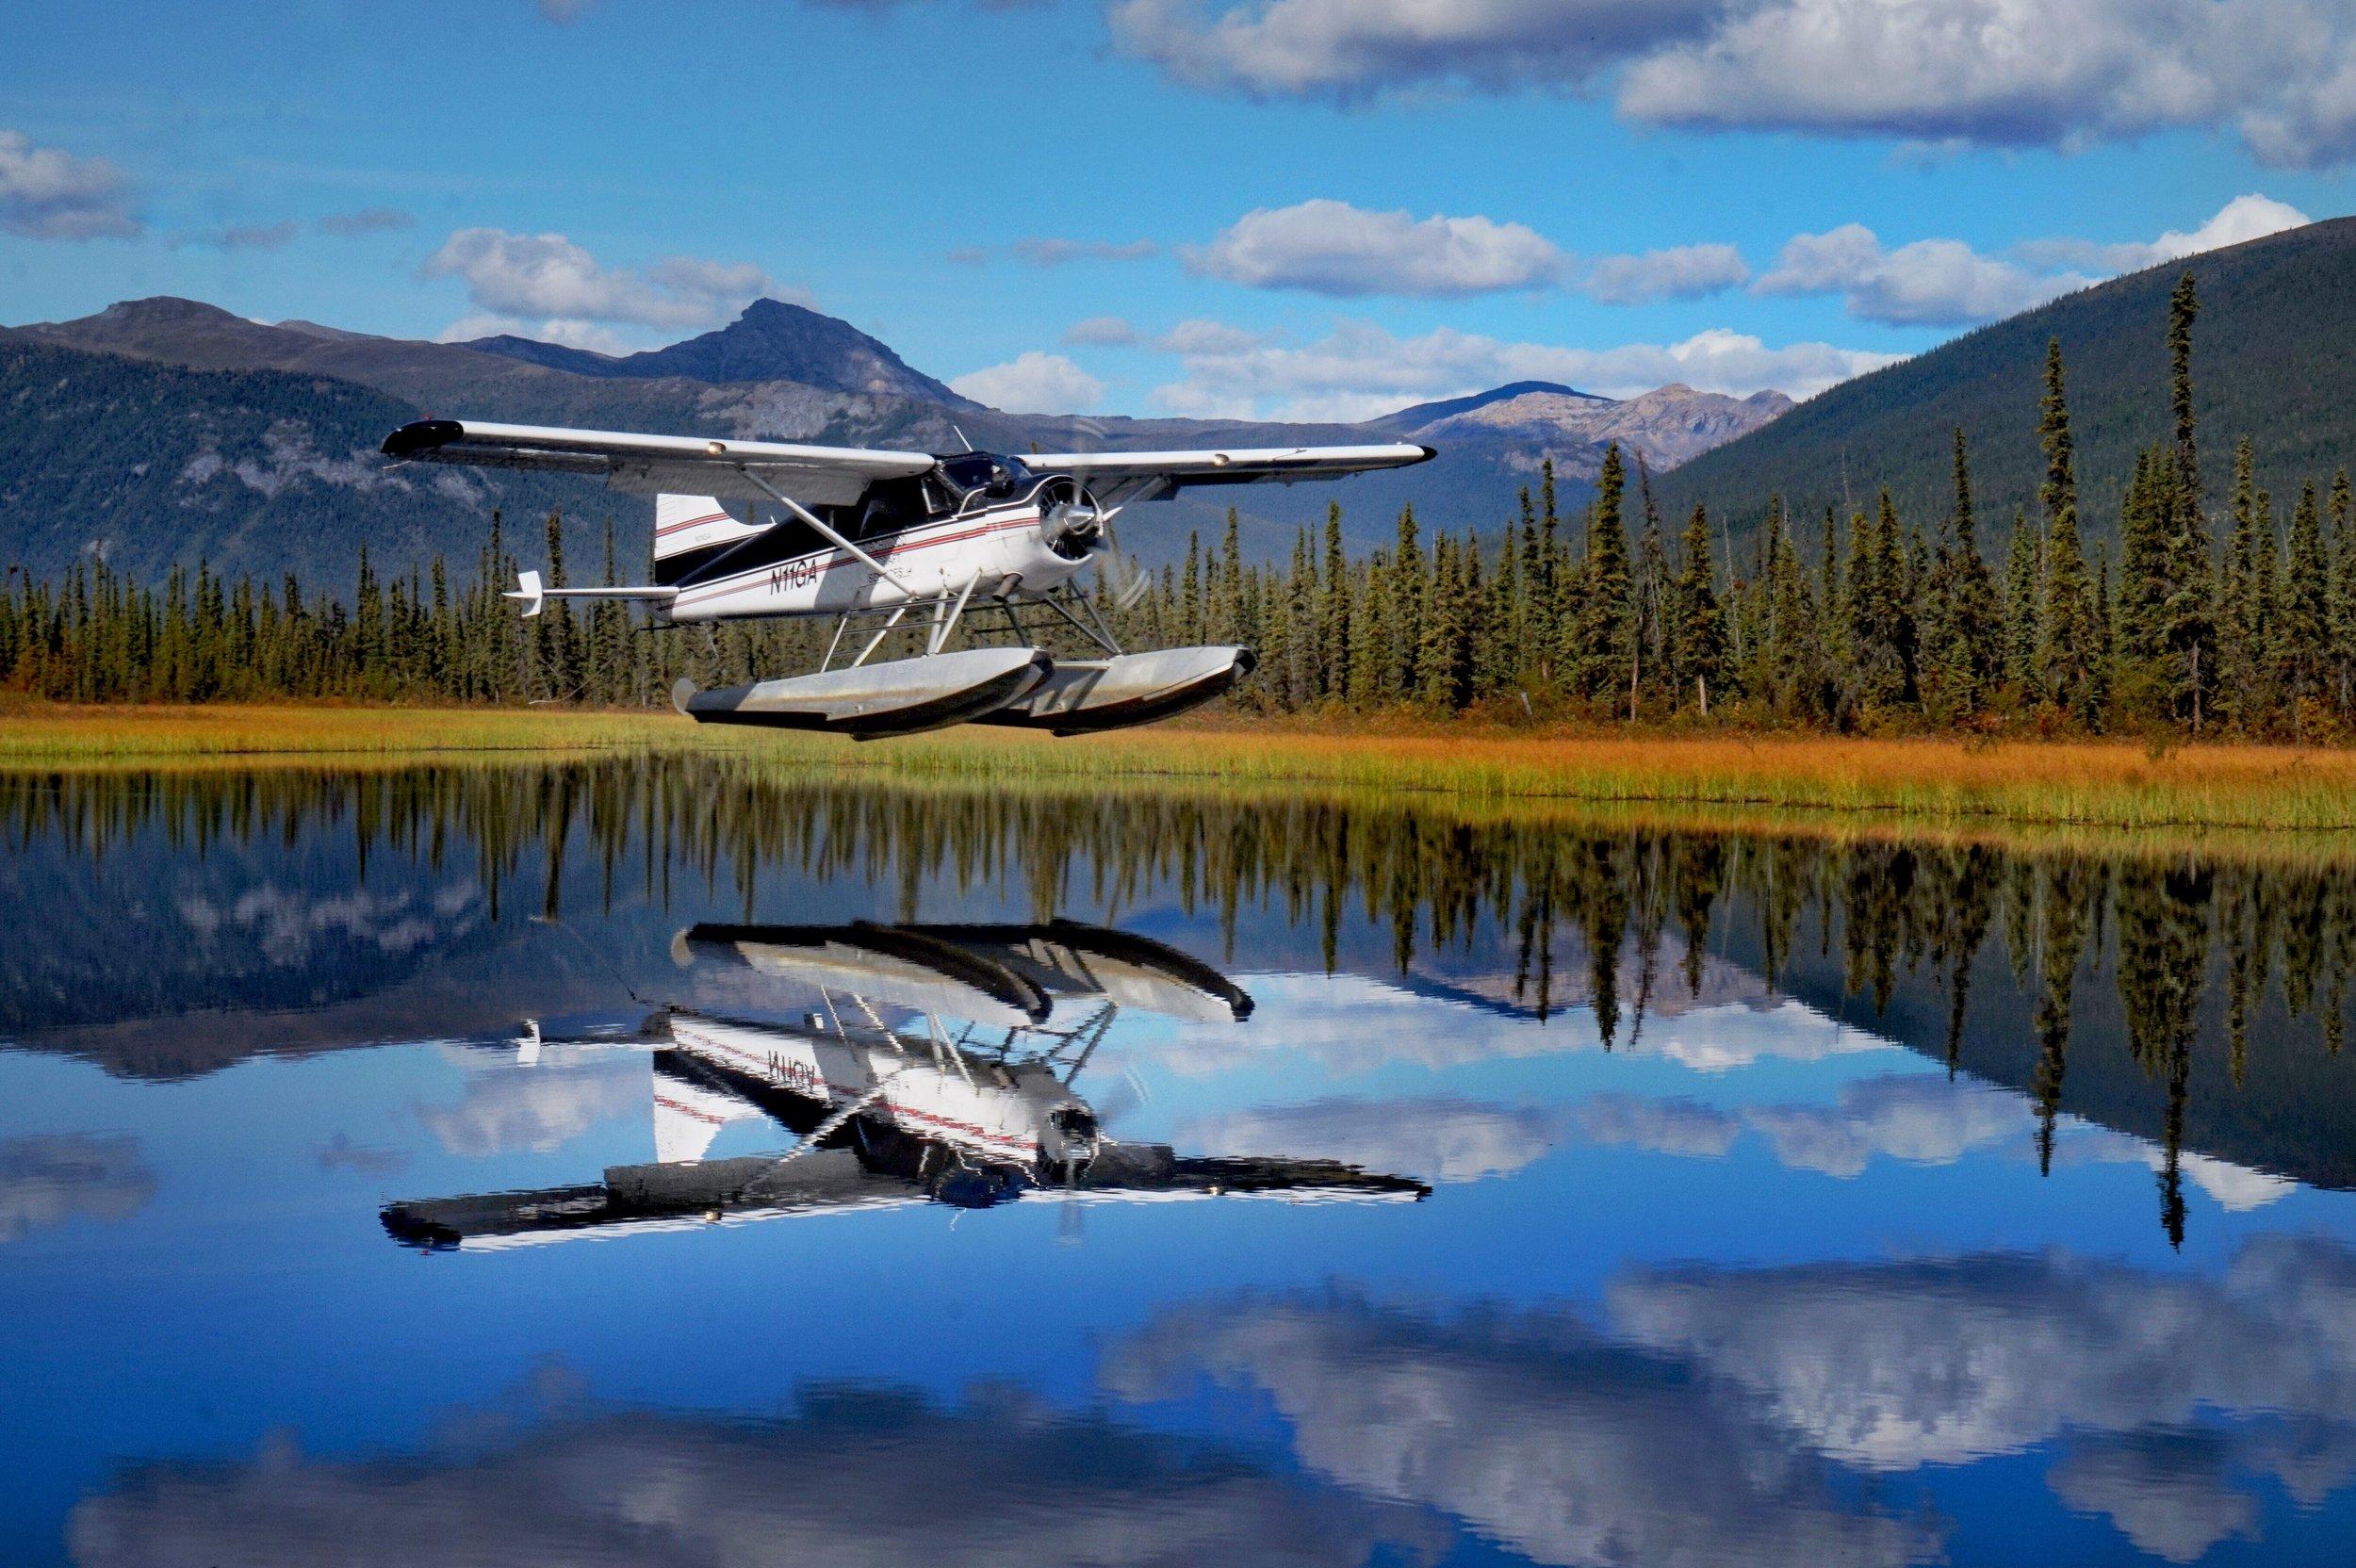 Bush Flying &The Alaska Factor - Reaching the Remote